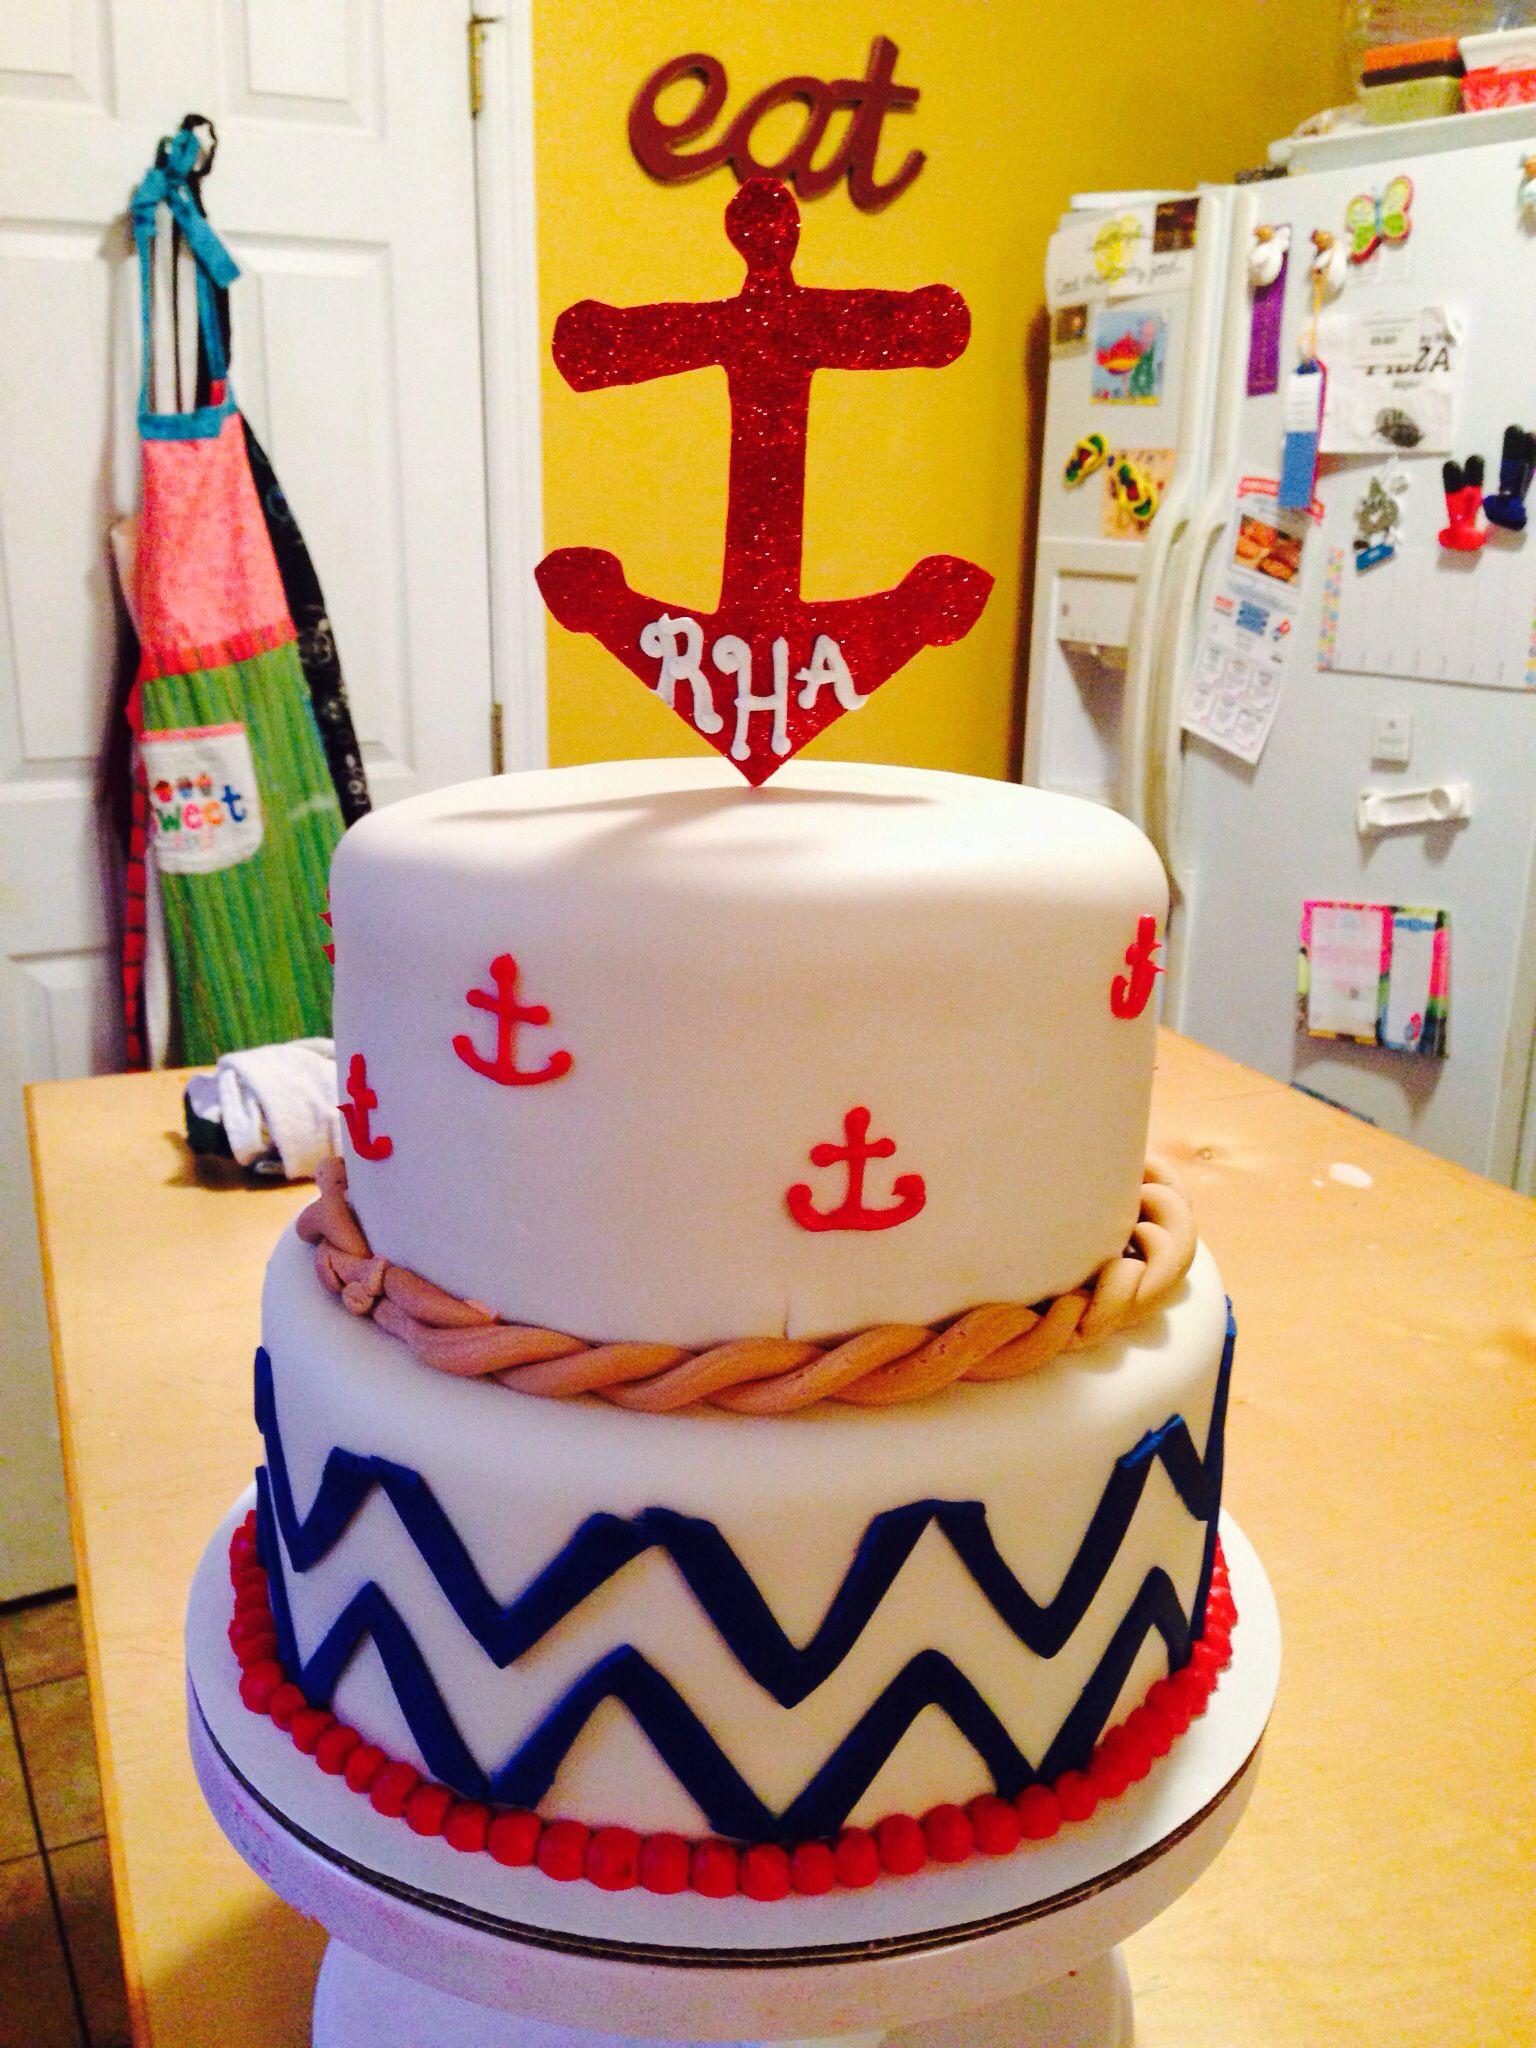 Anchor Birthday Cakes  Anchors and chevron cake